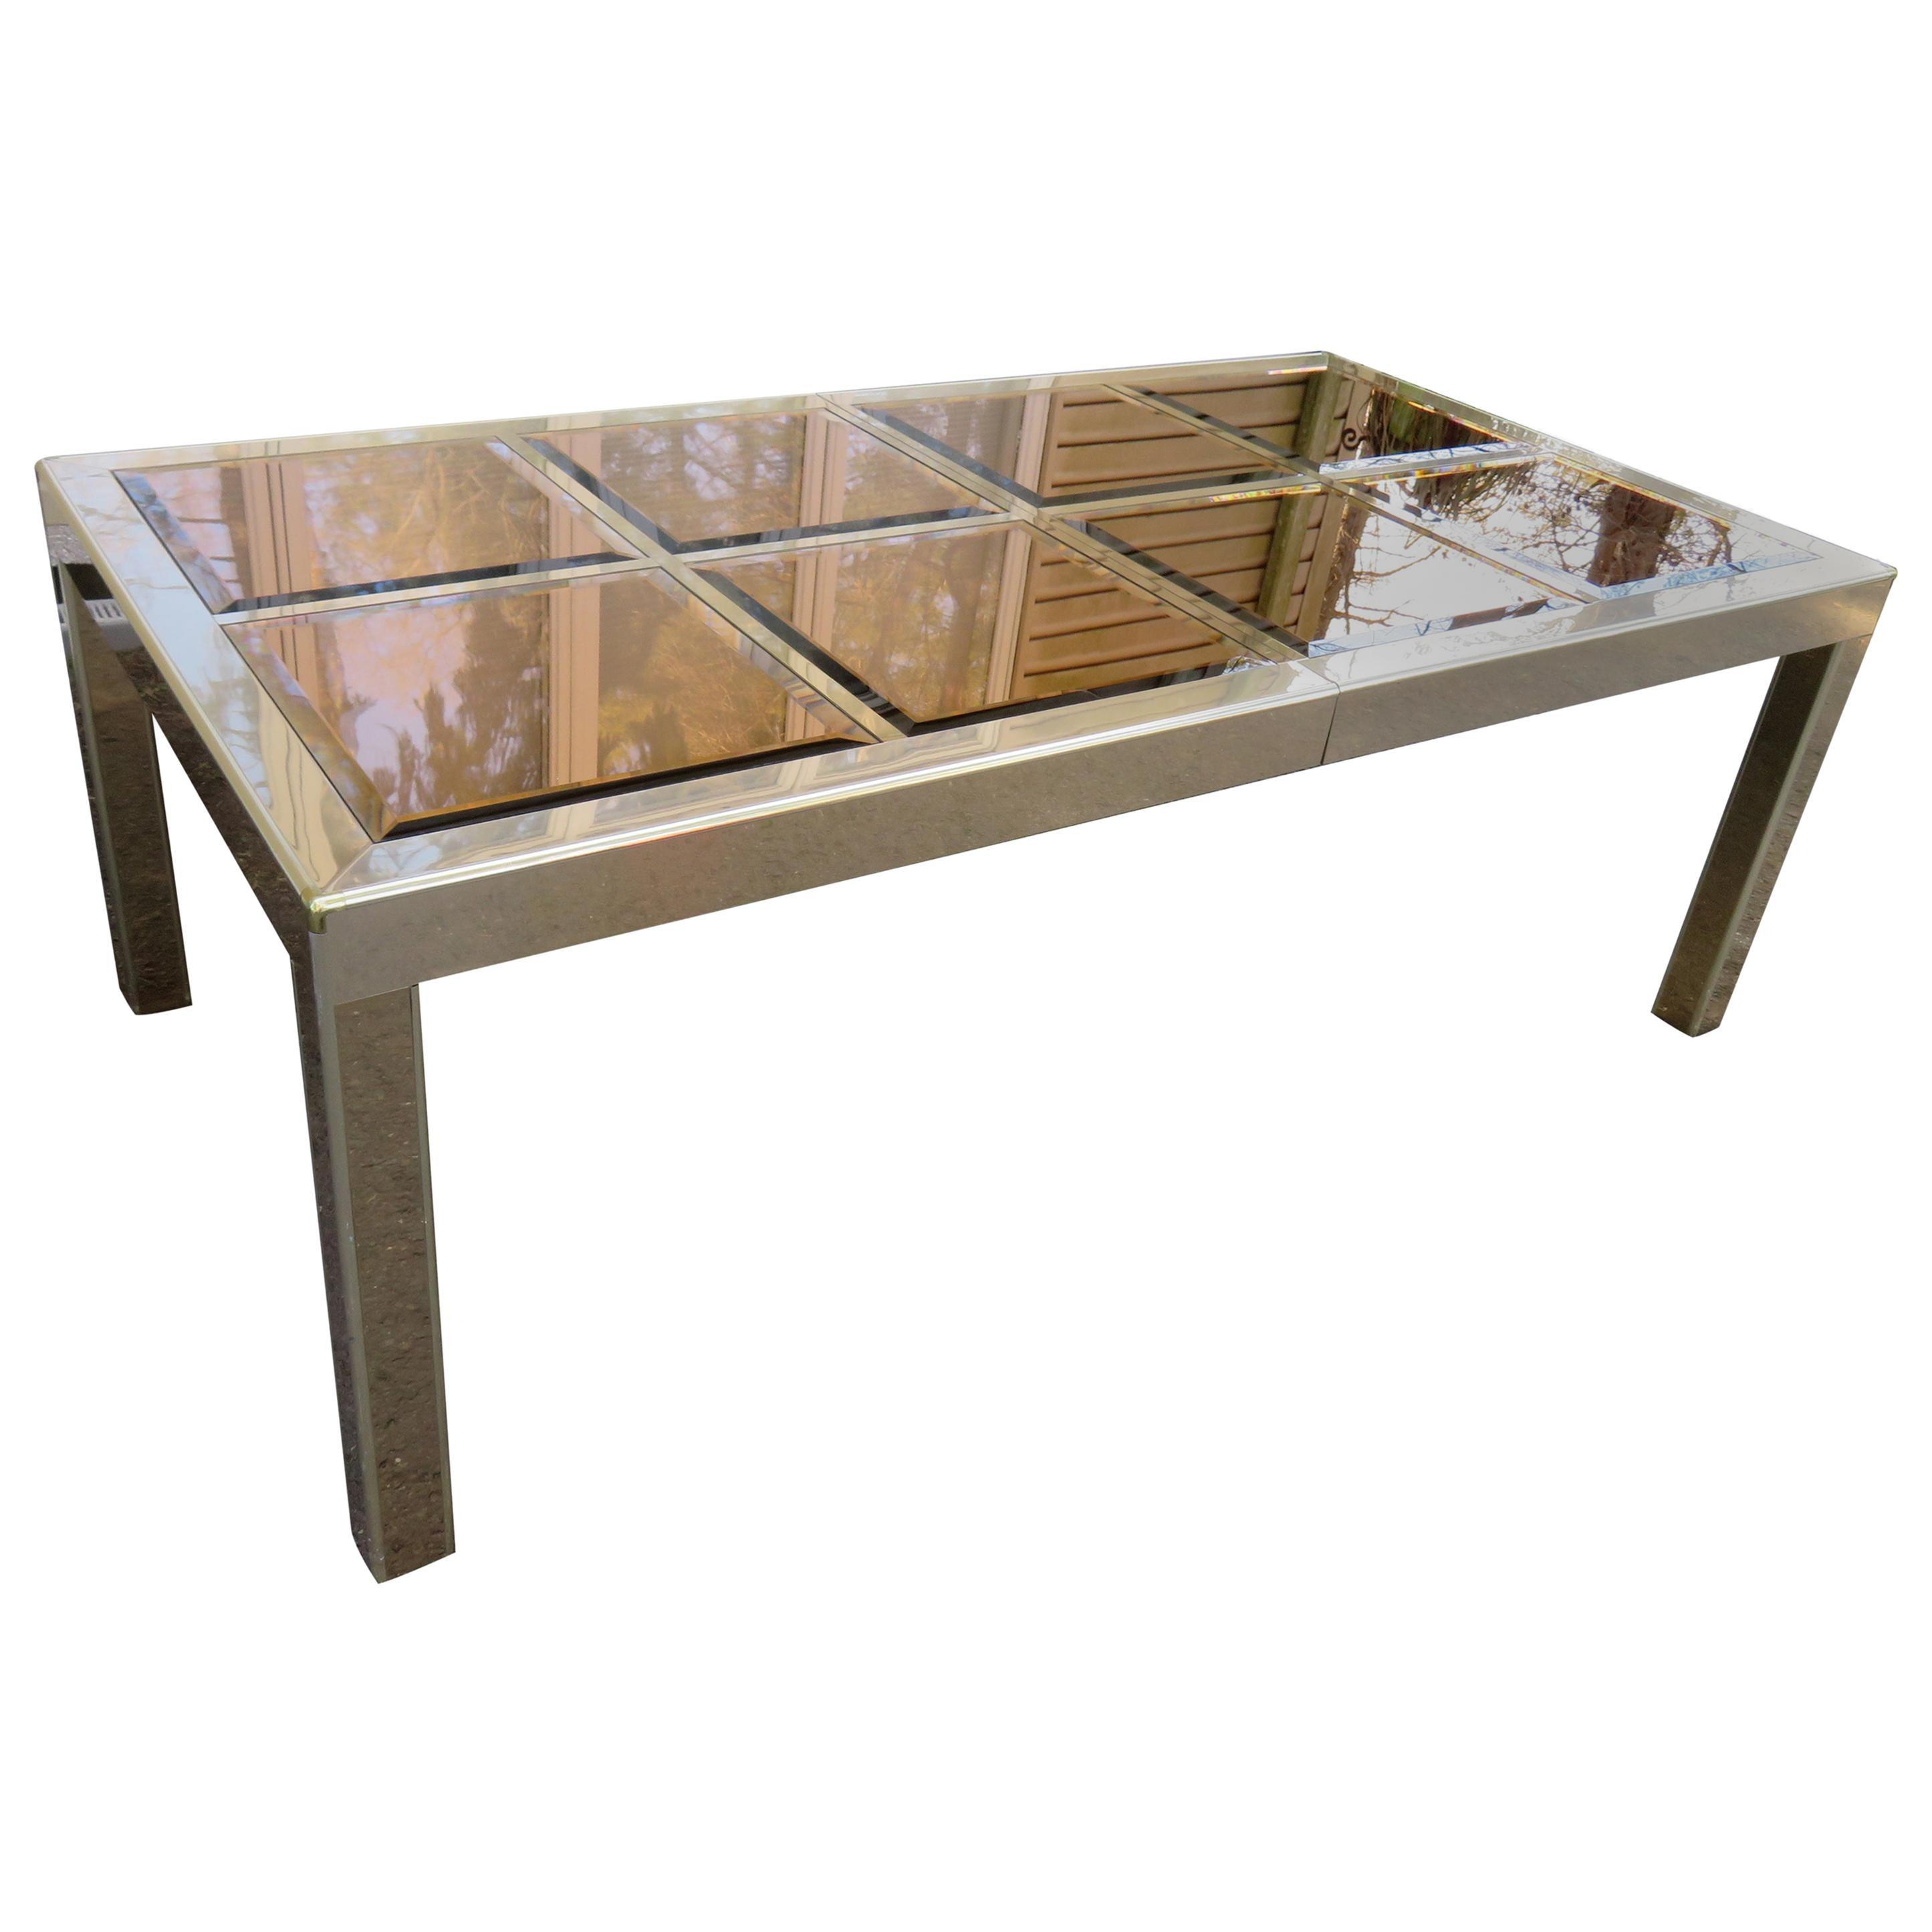 Mastercraft Brass Dining Table with Bronze Mirror Top Mid-Century Modern